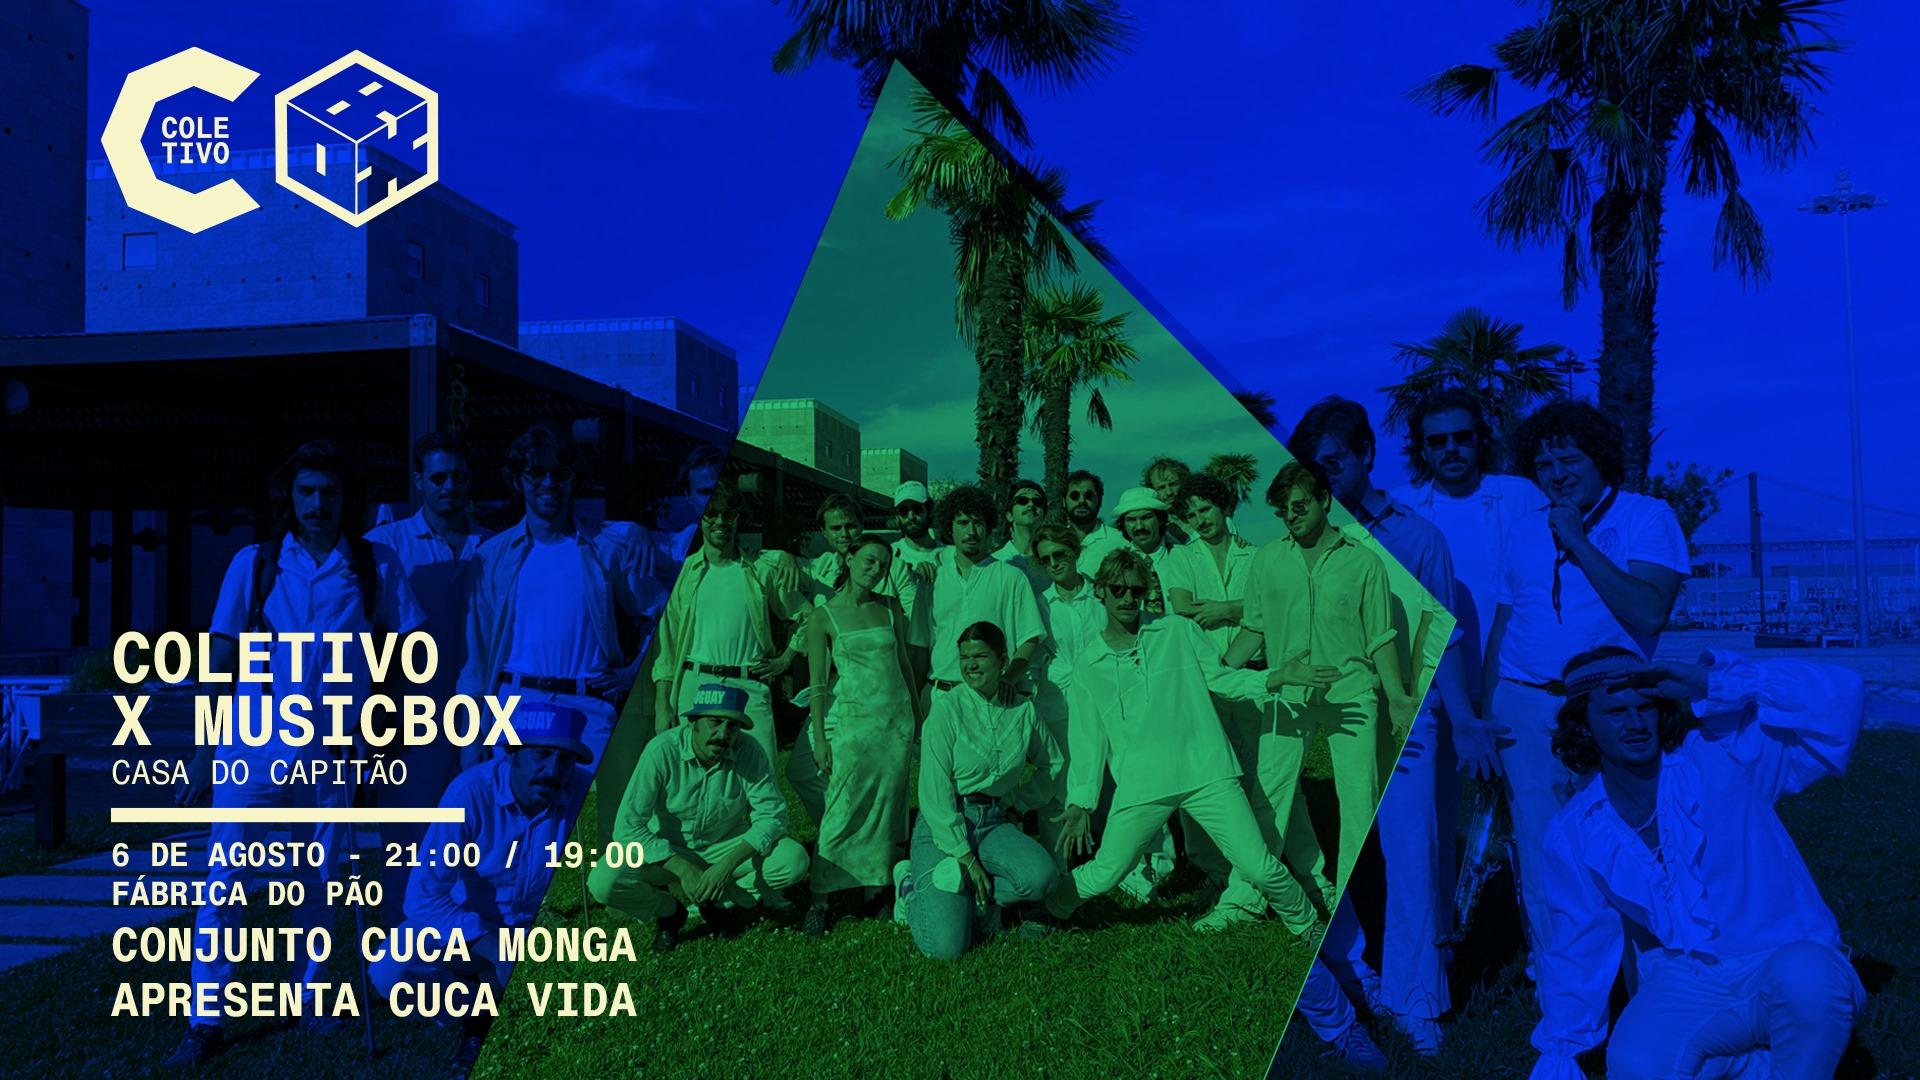 Conjunto Cuca Monga apresenta Cuca Vida • concerto na fábrica